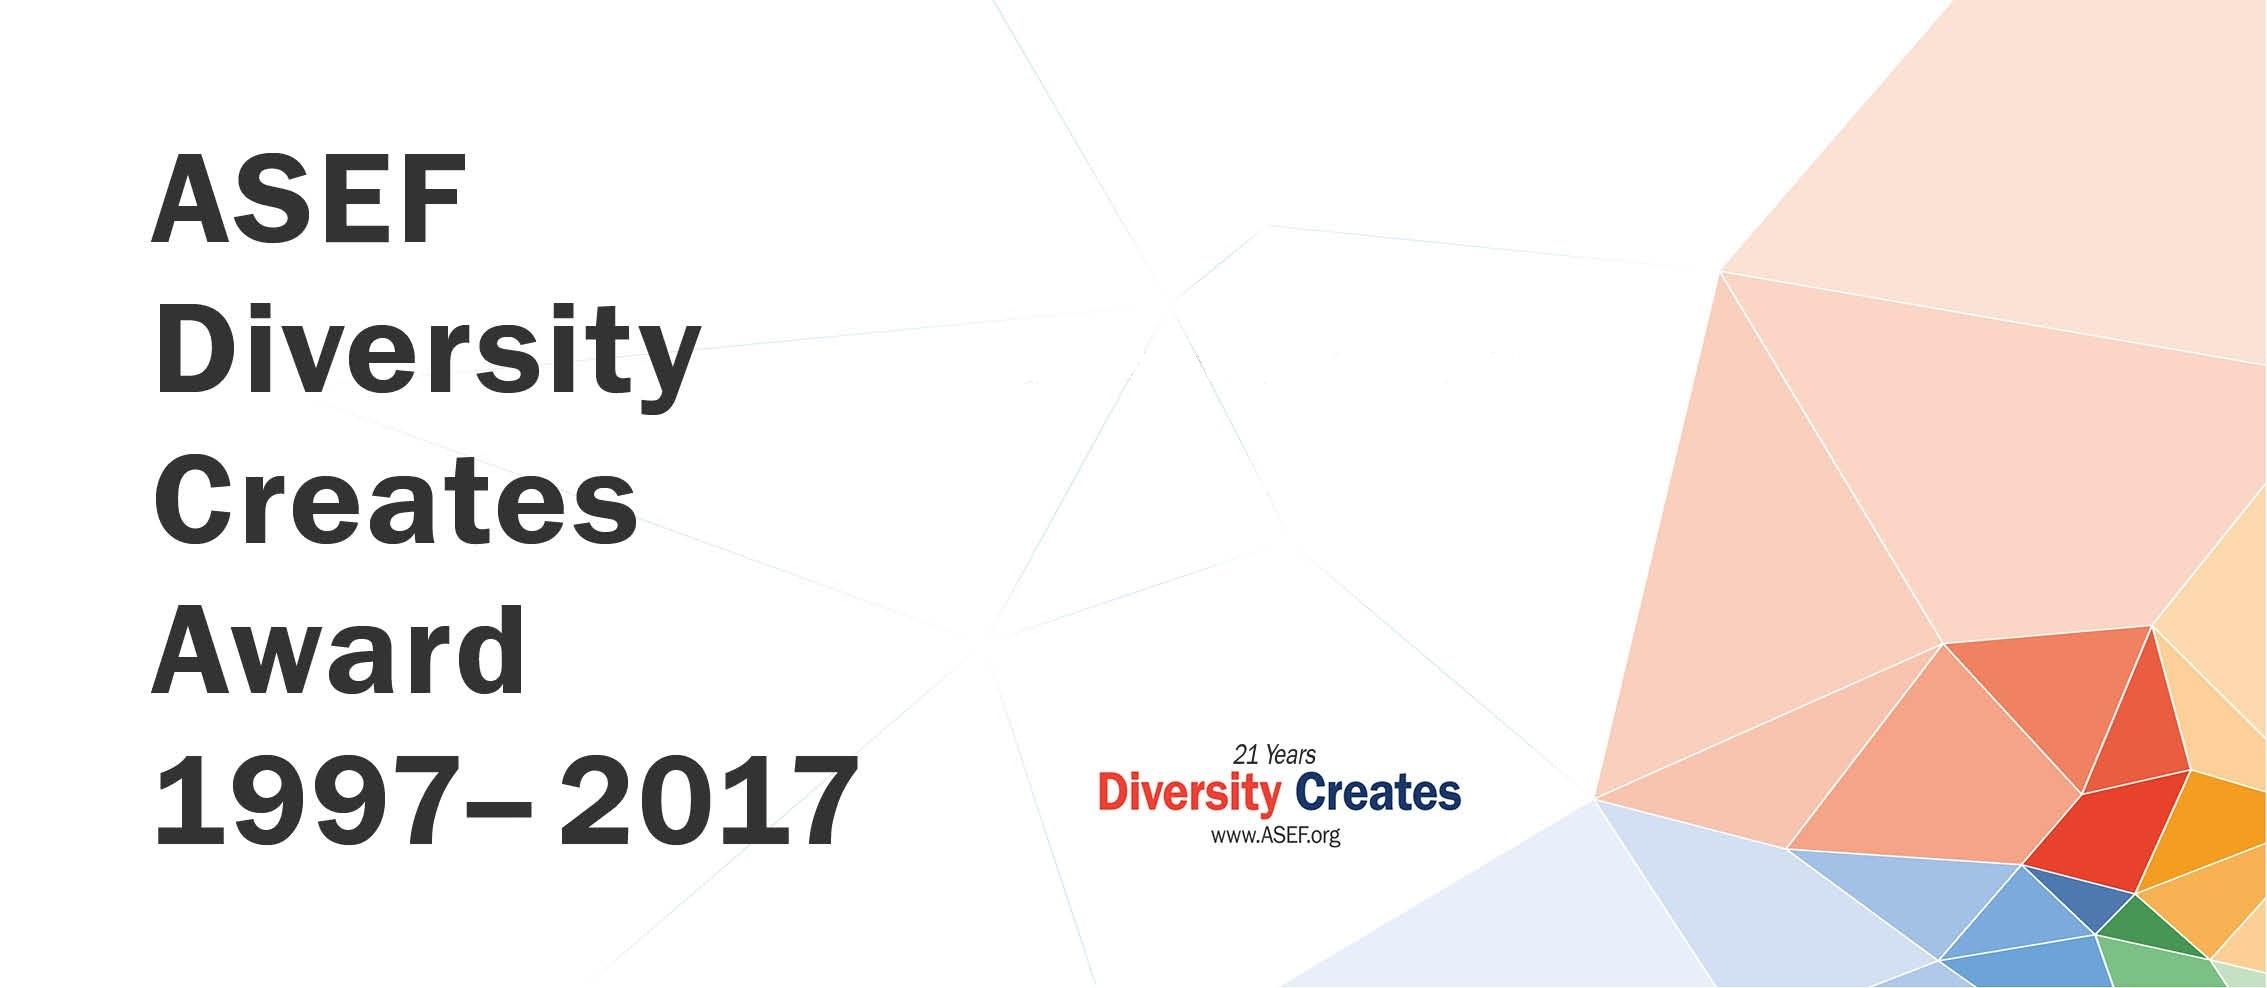 asef-diversity-creates banner